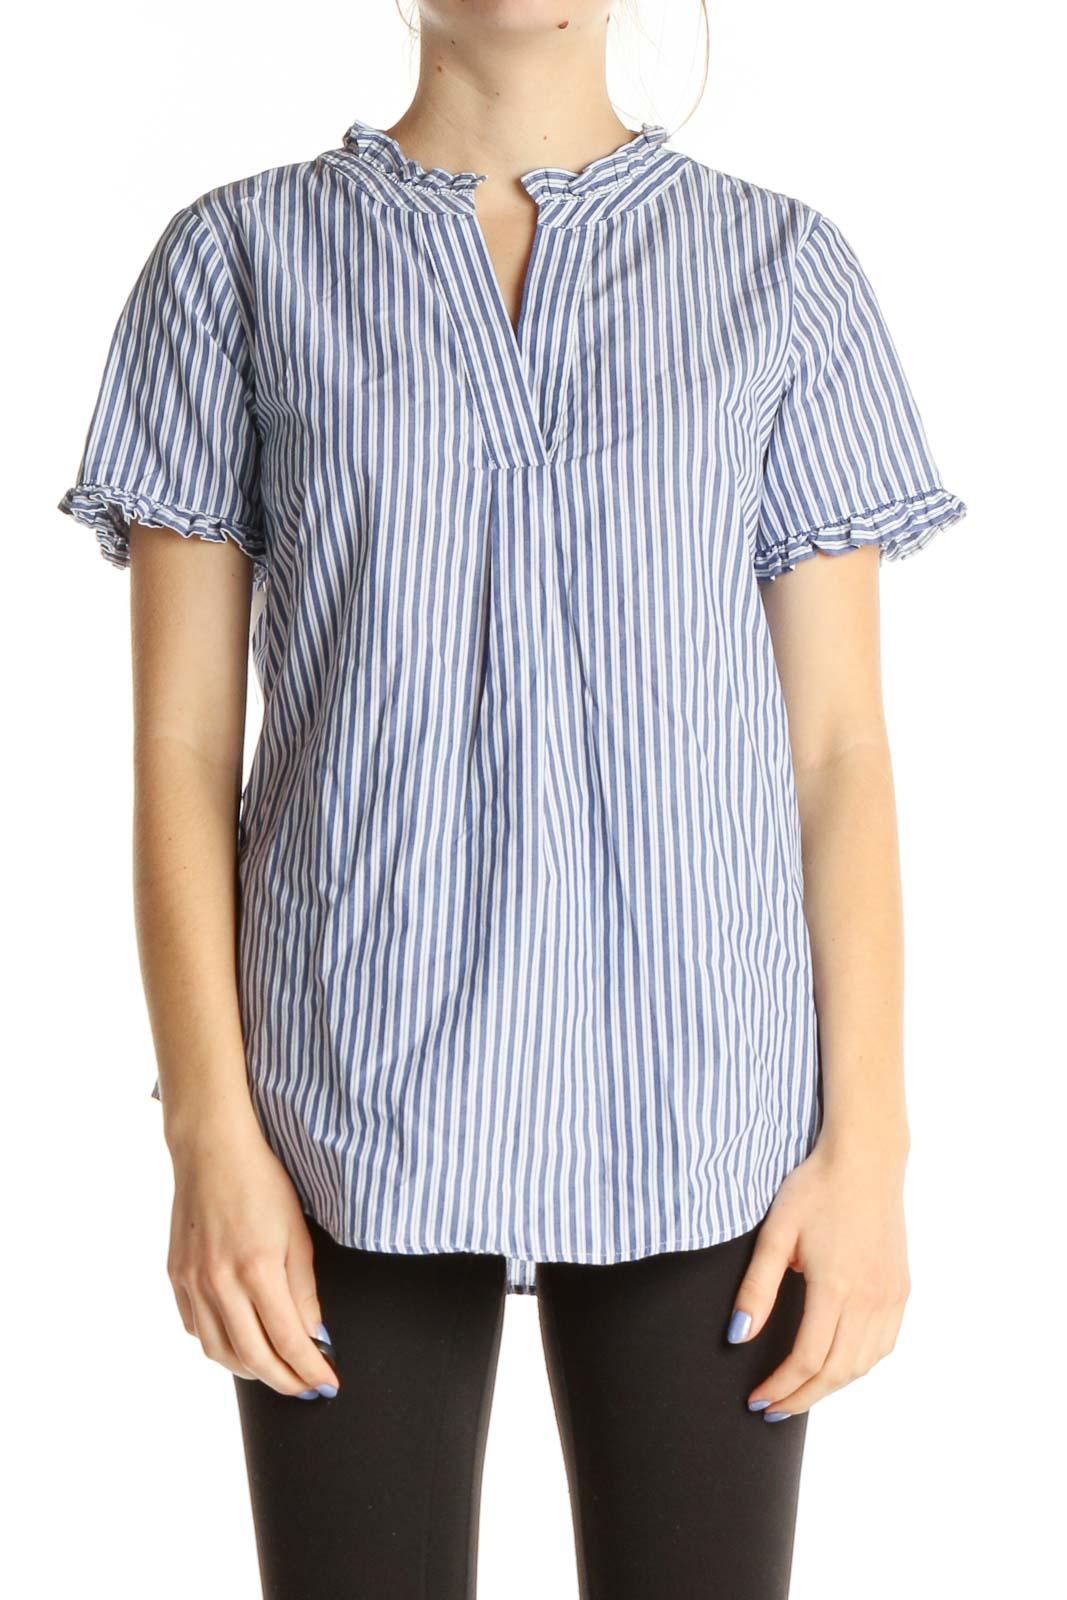 Blue Striped Brunch Shirt Front